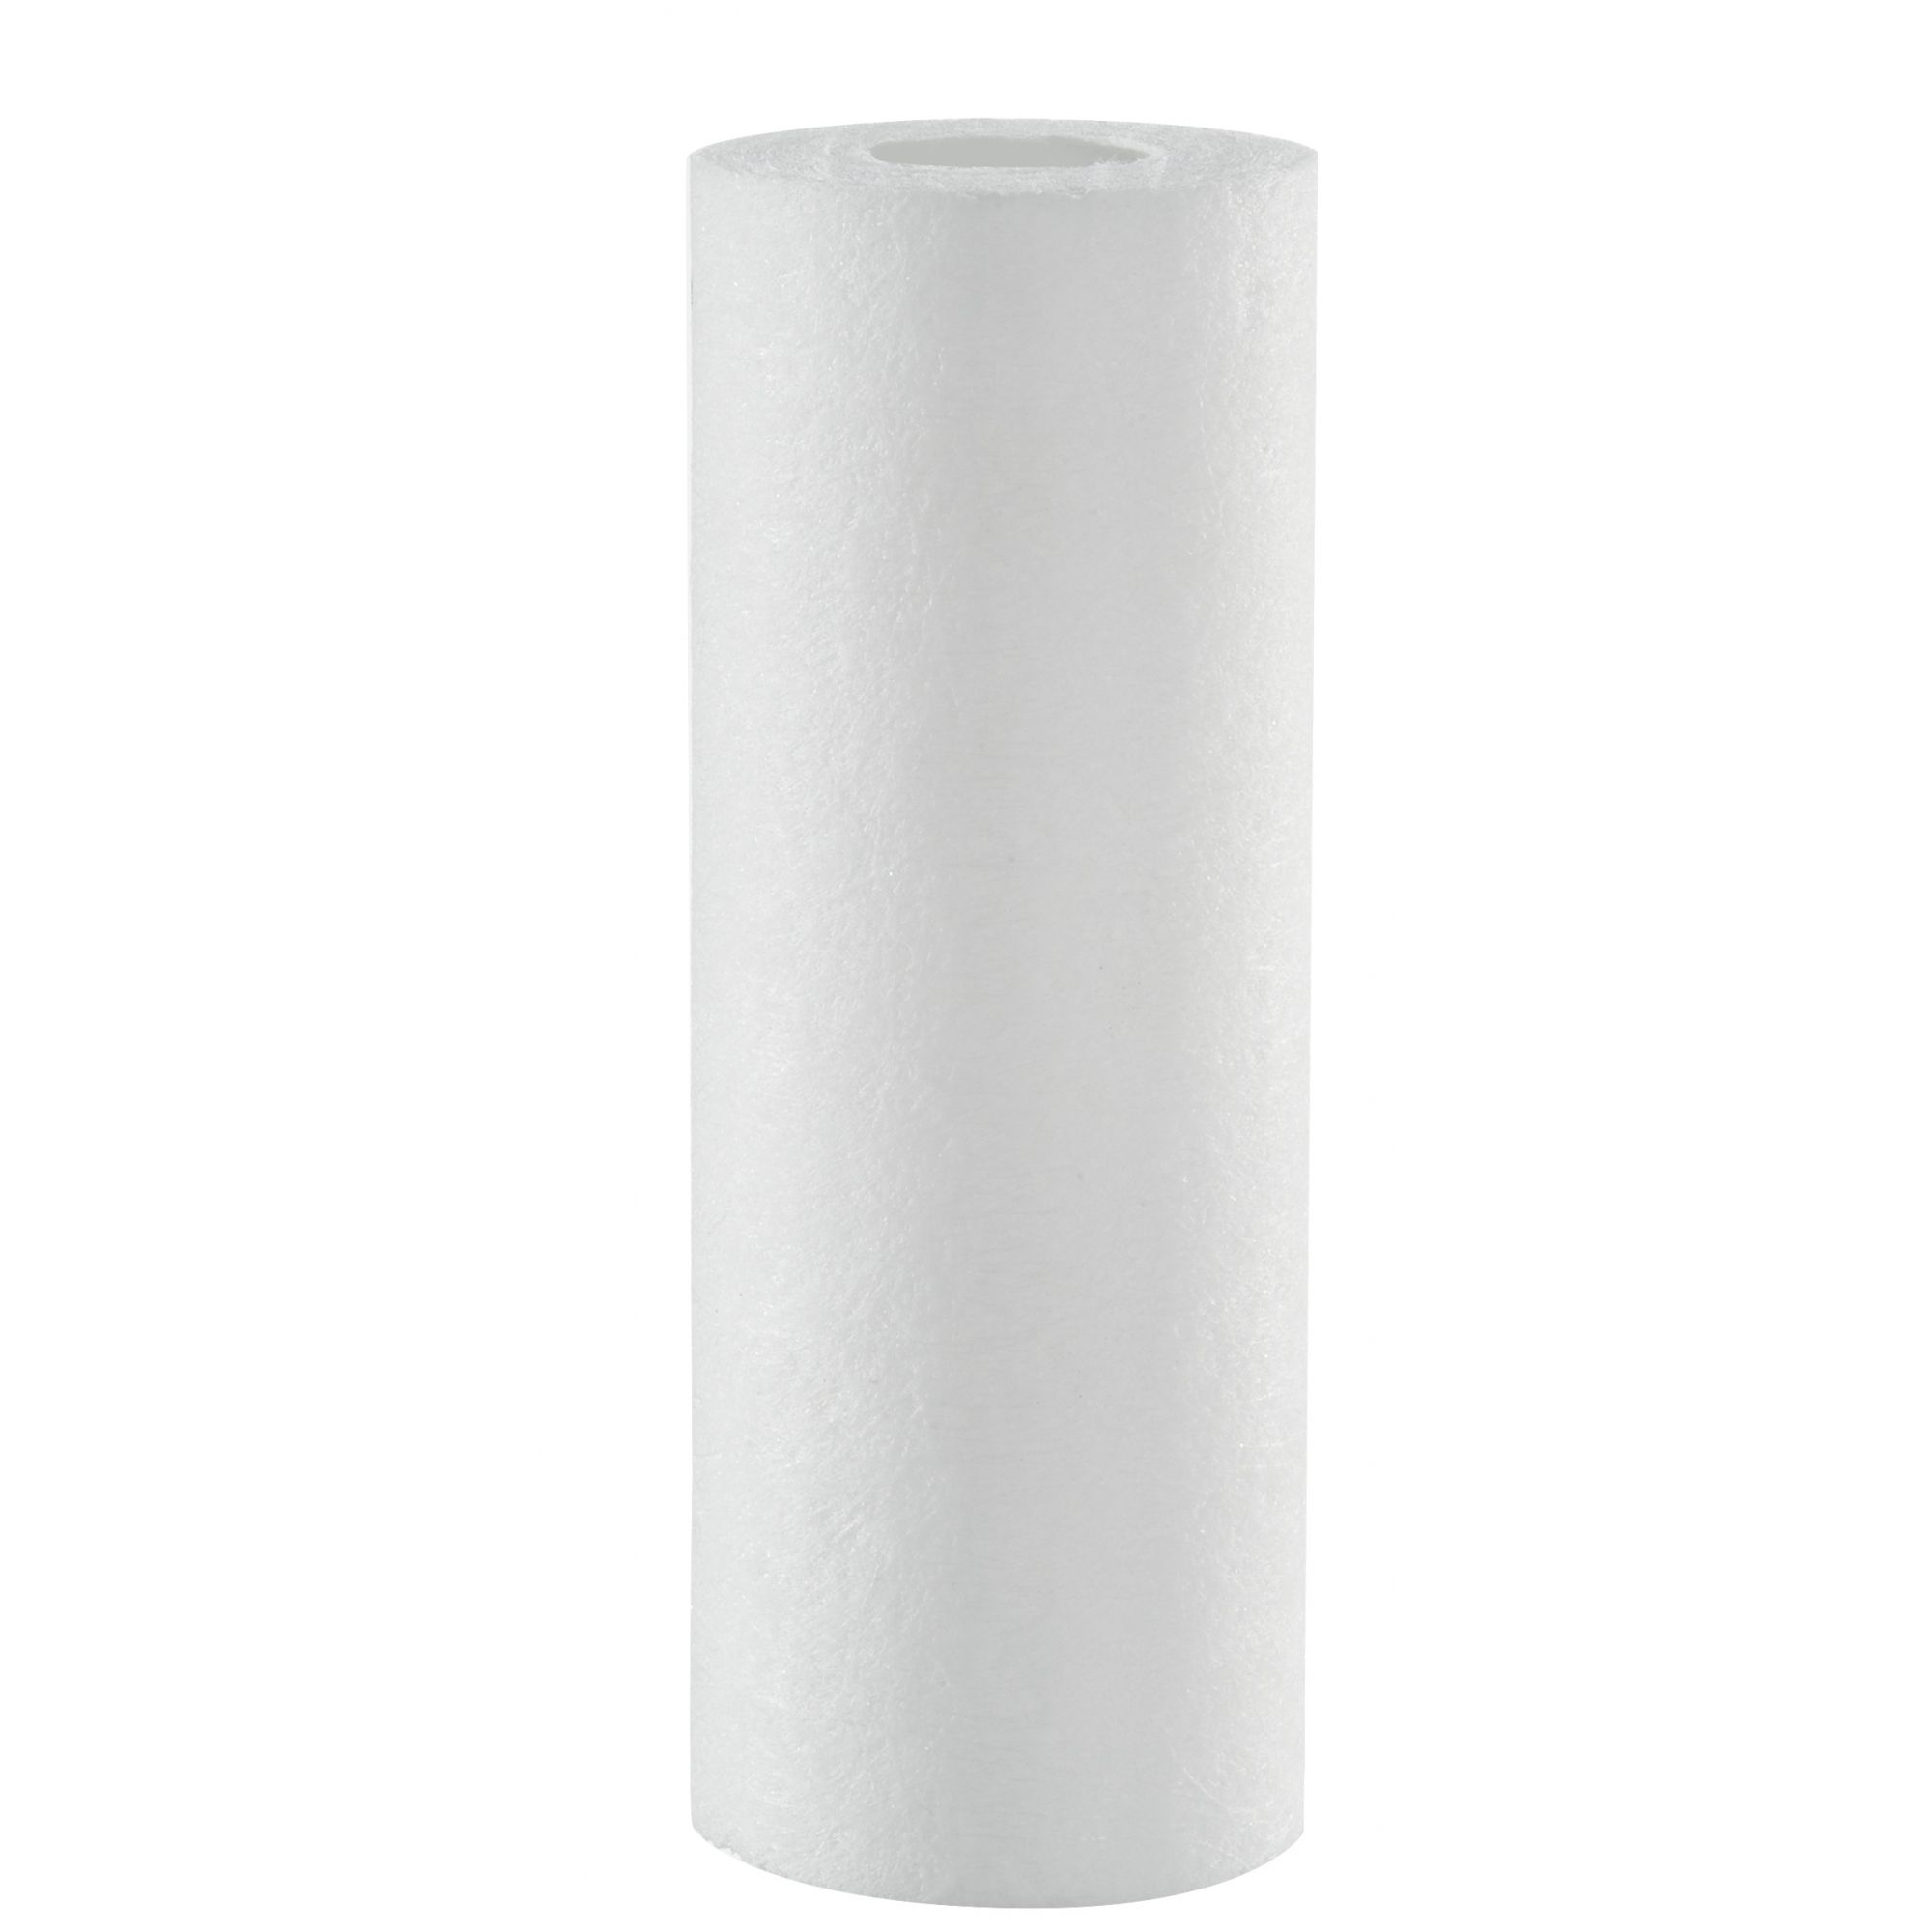 Filtro de água POE 5 x 2.1/2 Branco PP // Para Máquina de Lavar Roupas